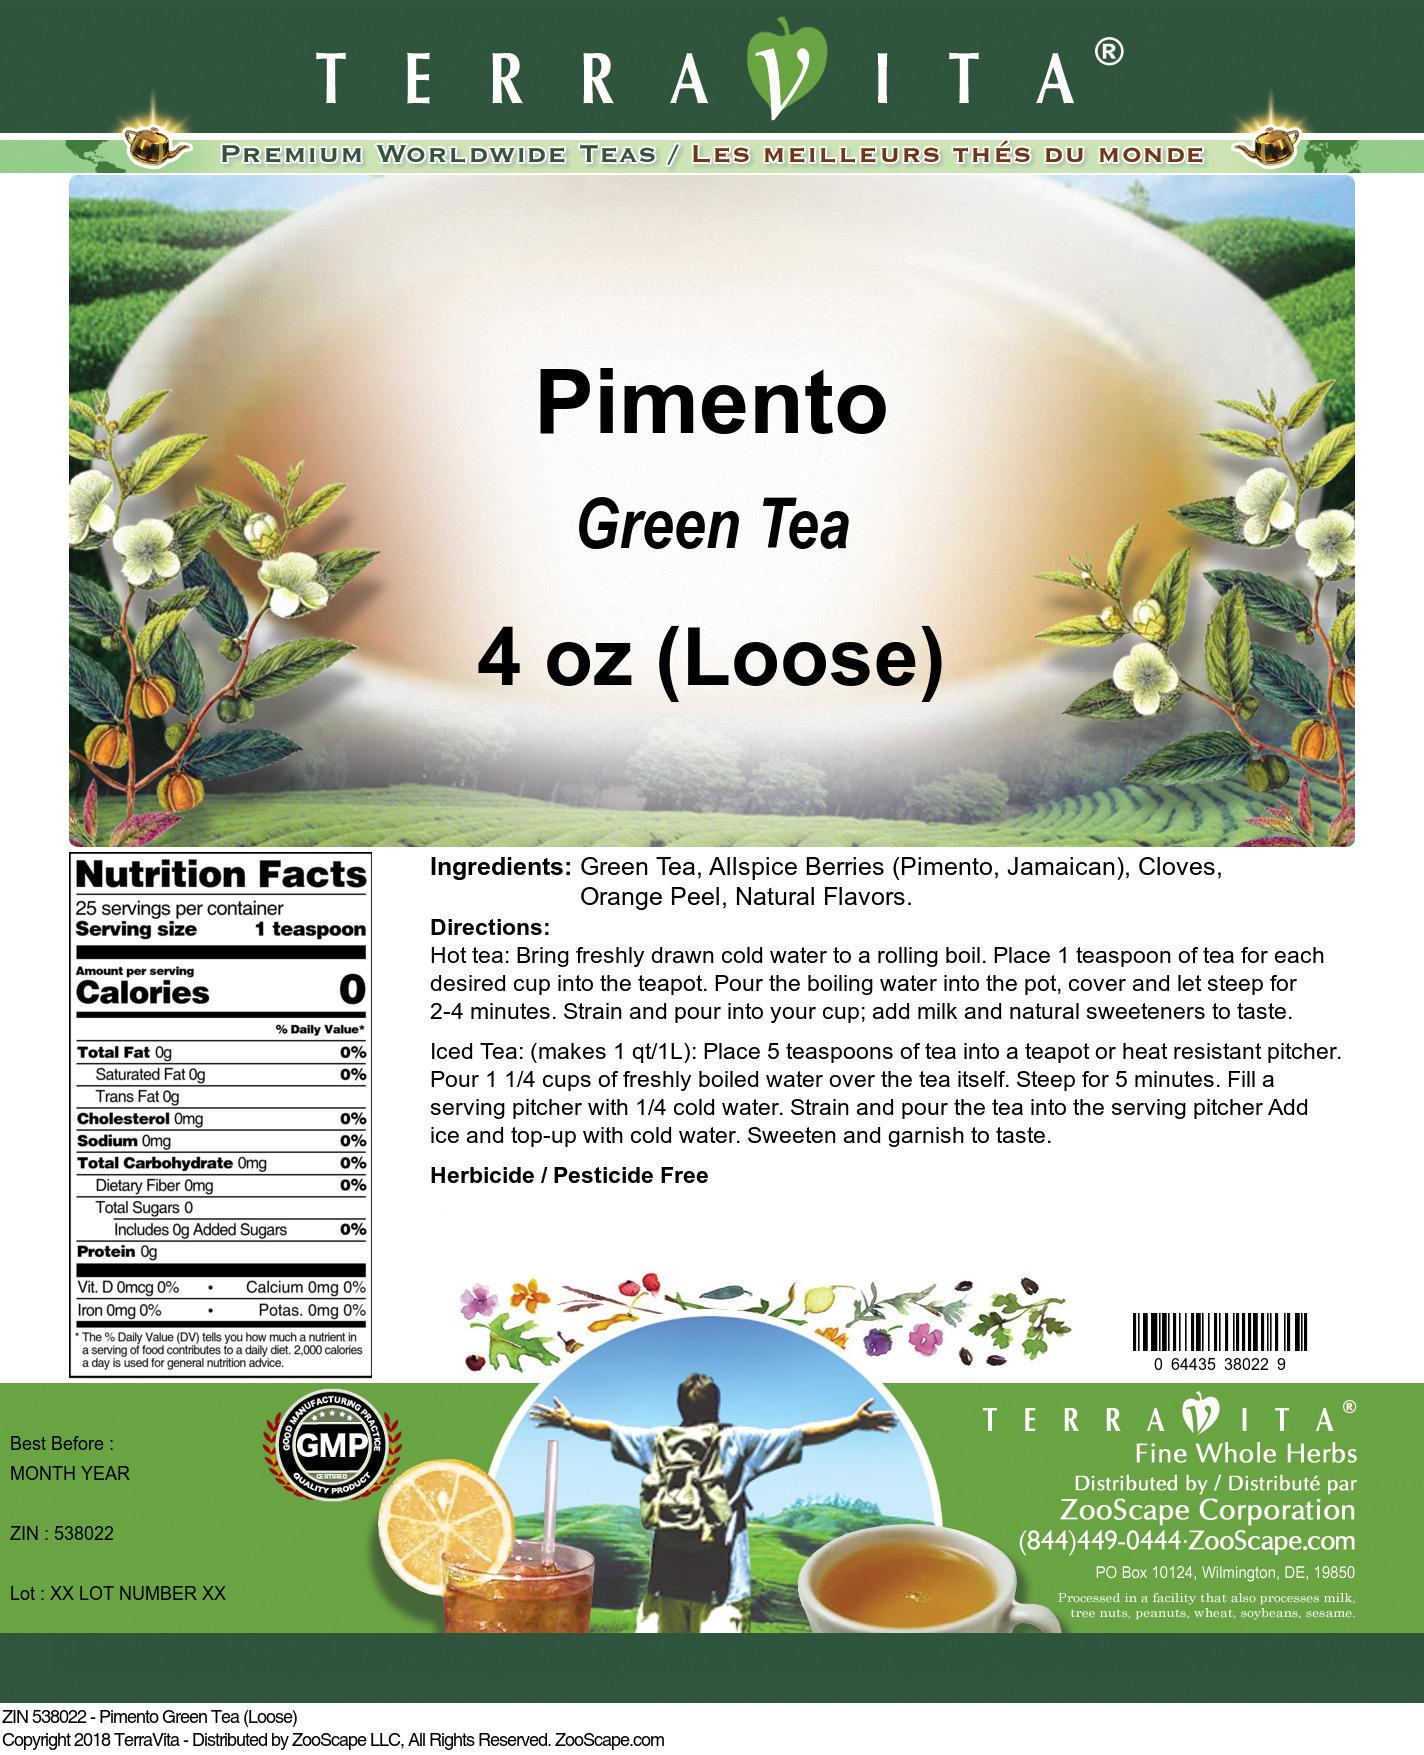 Pimento Green Tea (Loose)